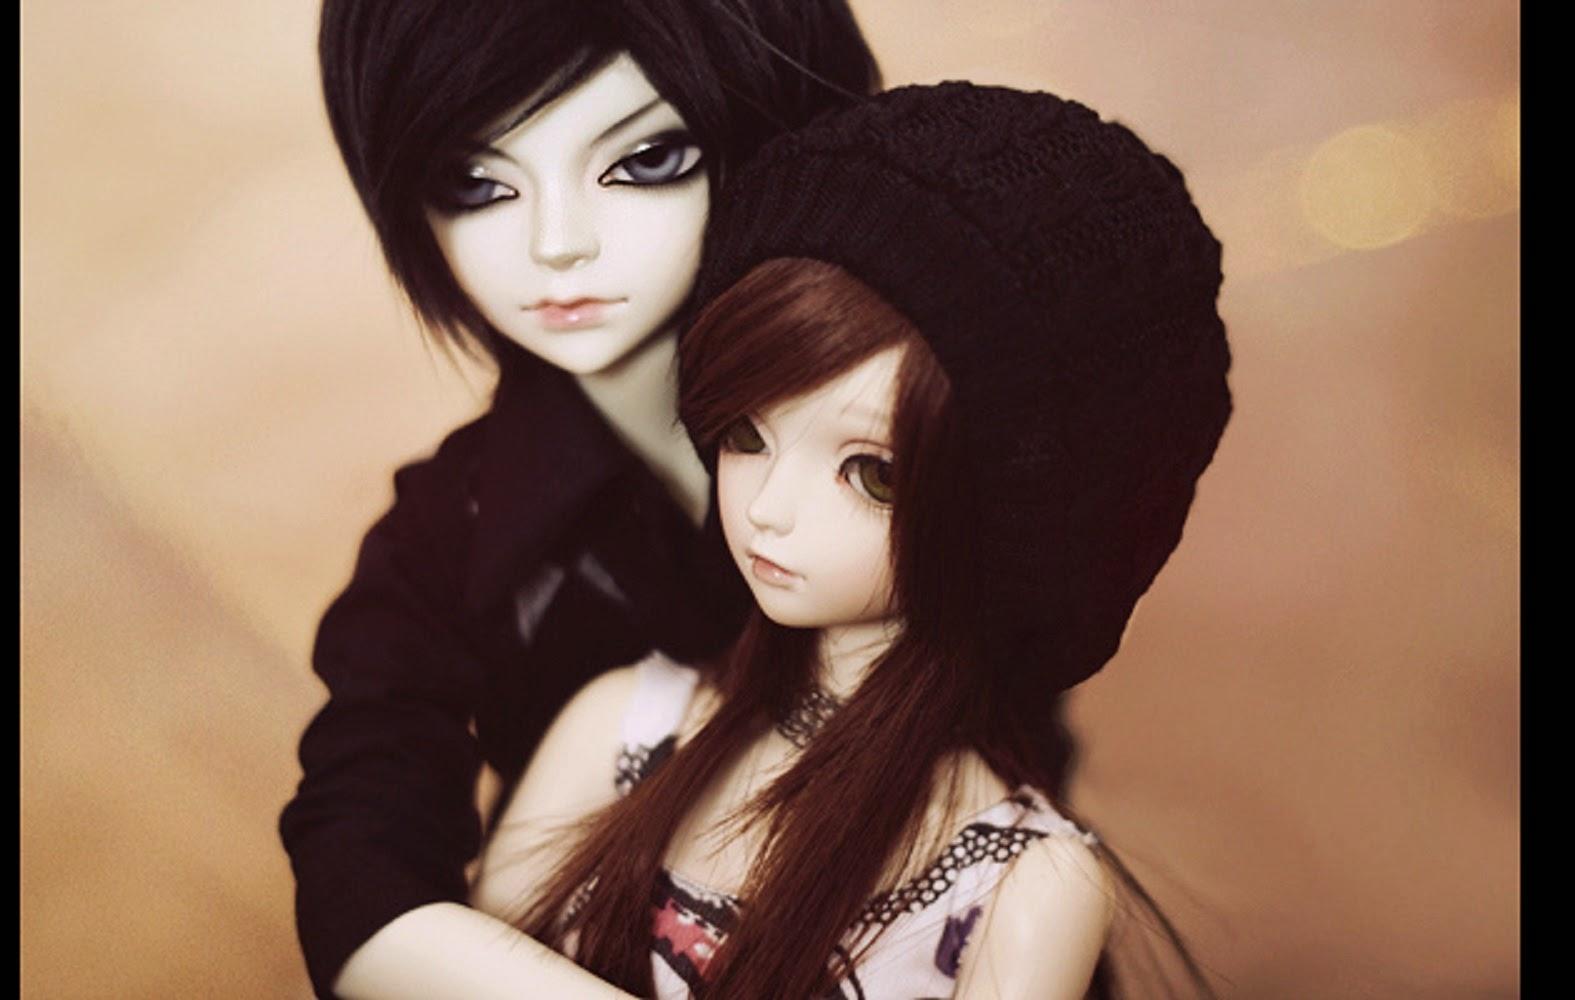 Doll Couple Cute HD Wallpaper Free